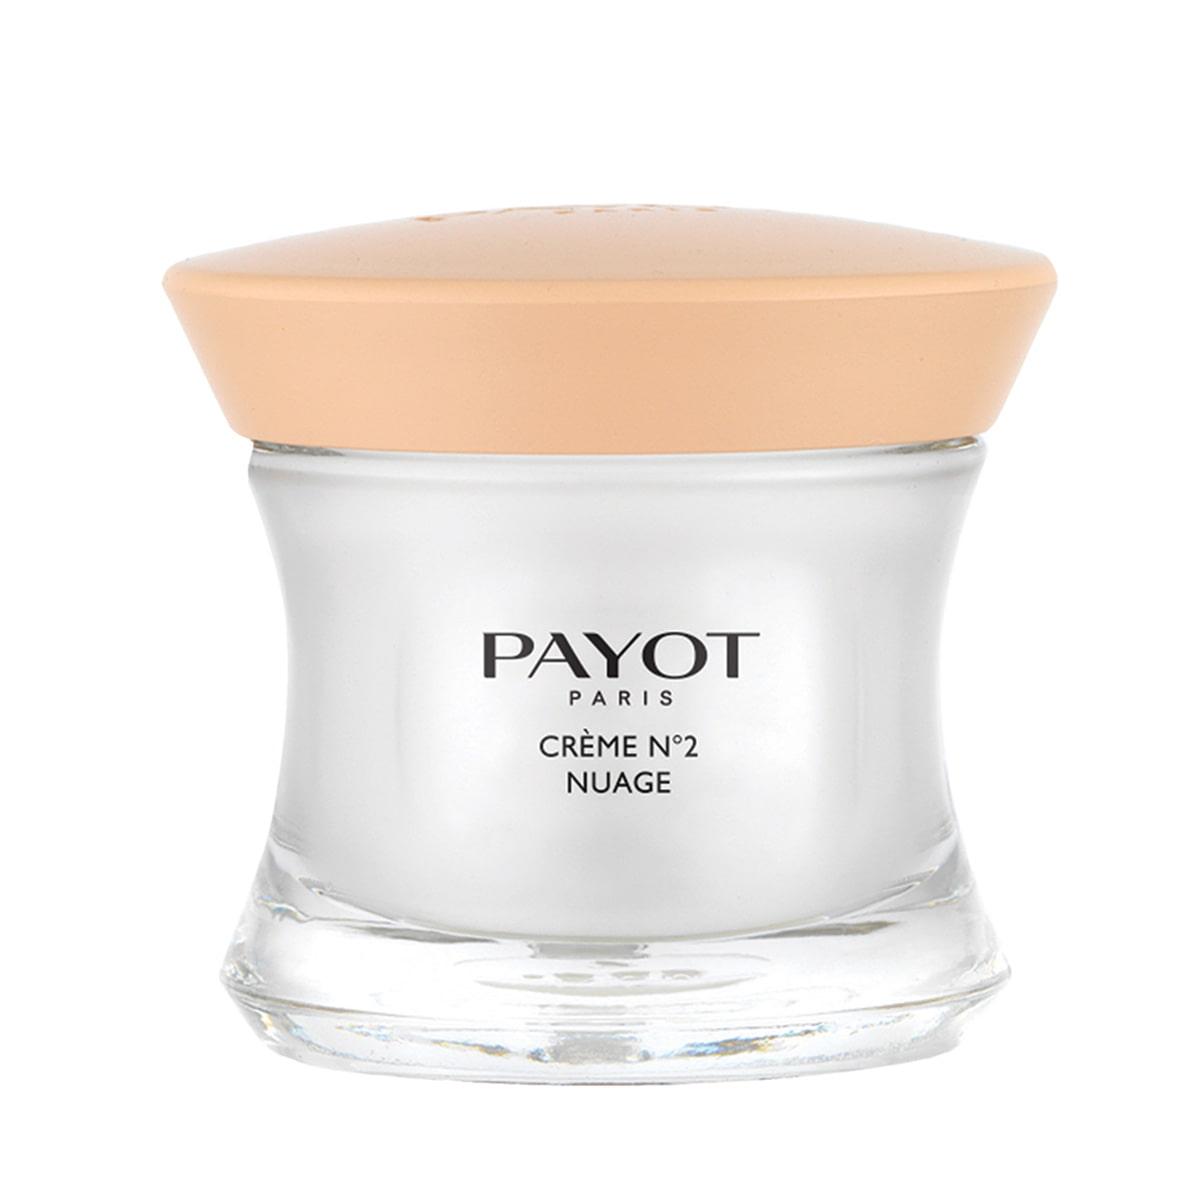 Payot - Crème N°2 Nuage - Soin apaisant anti-stress anti-rougeurs